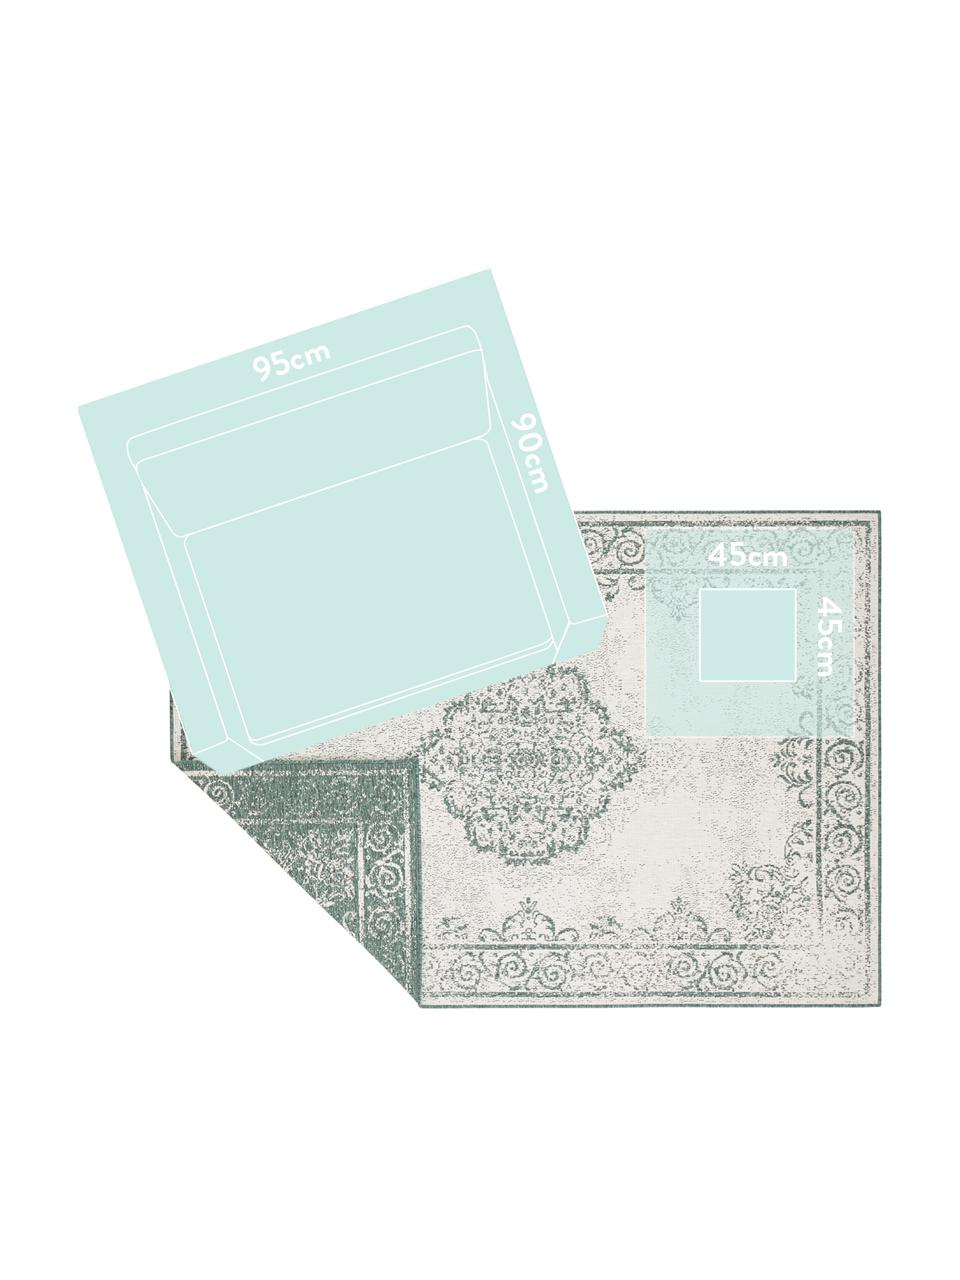 Tappeto vintage da interno-esterno Cebu, Polipropilene, Verde, crema, Larg.160 x Lung. 230 cm (taglia M)